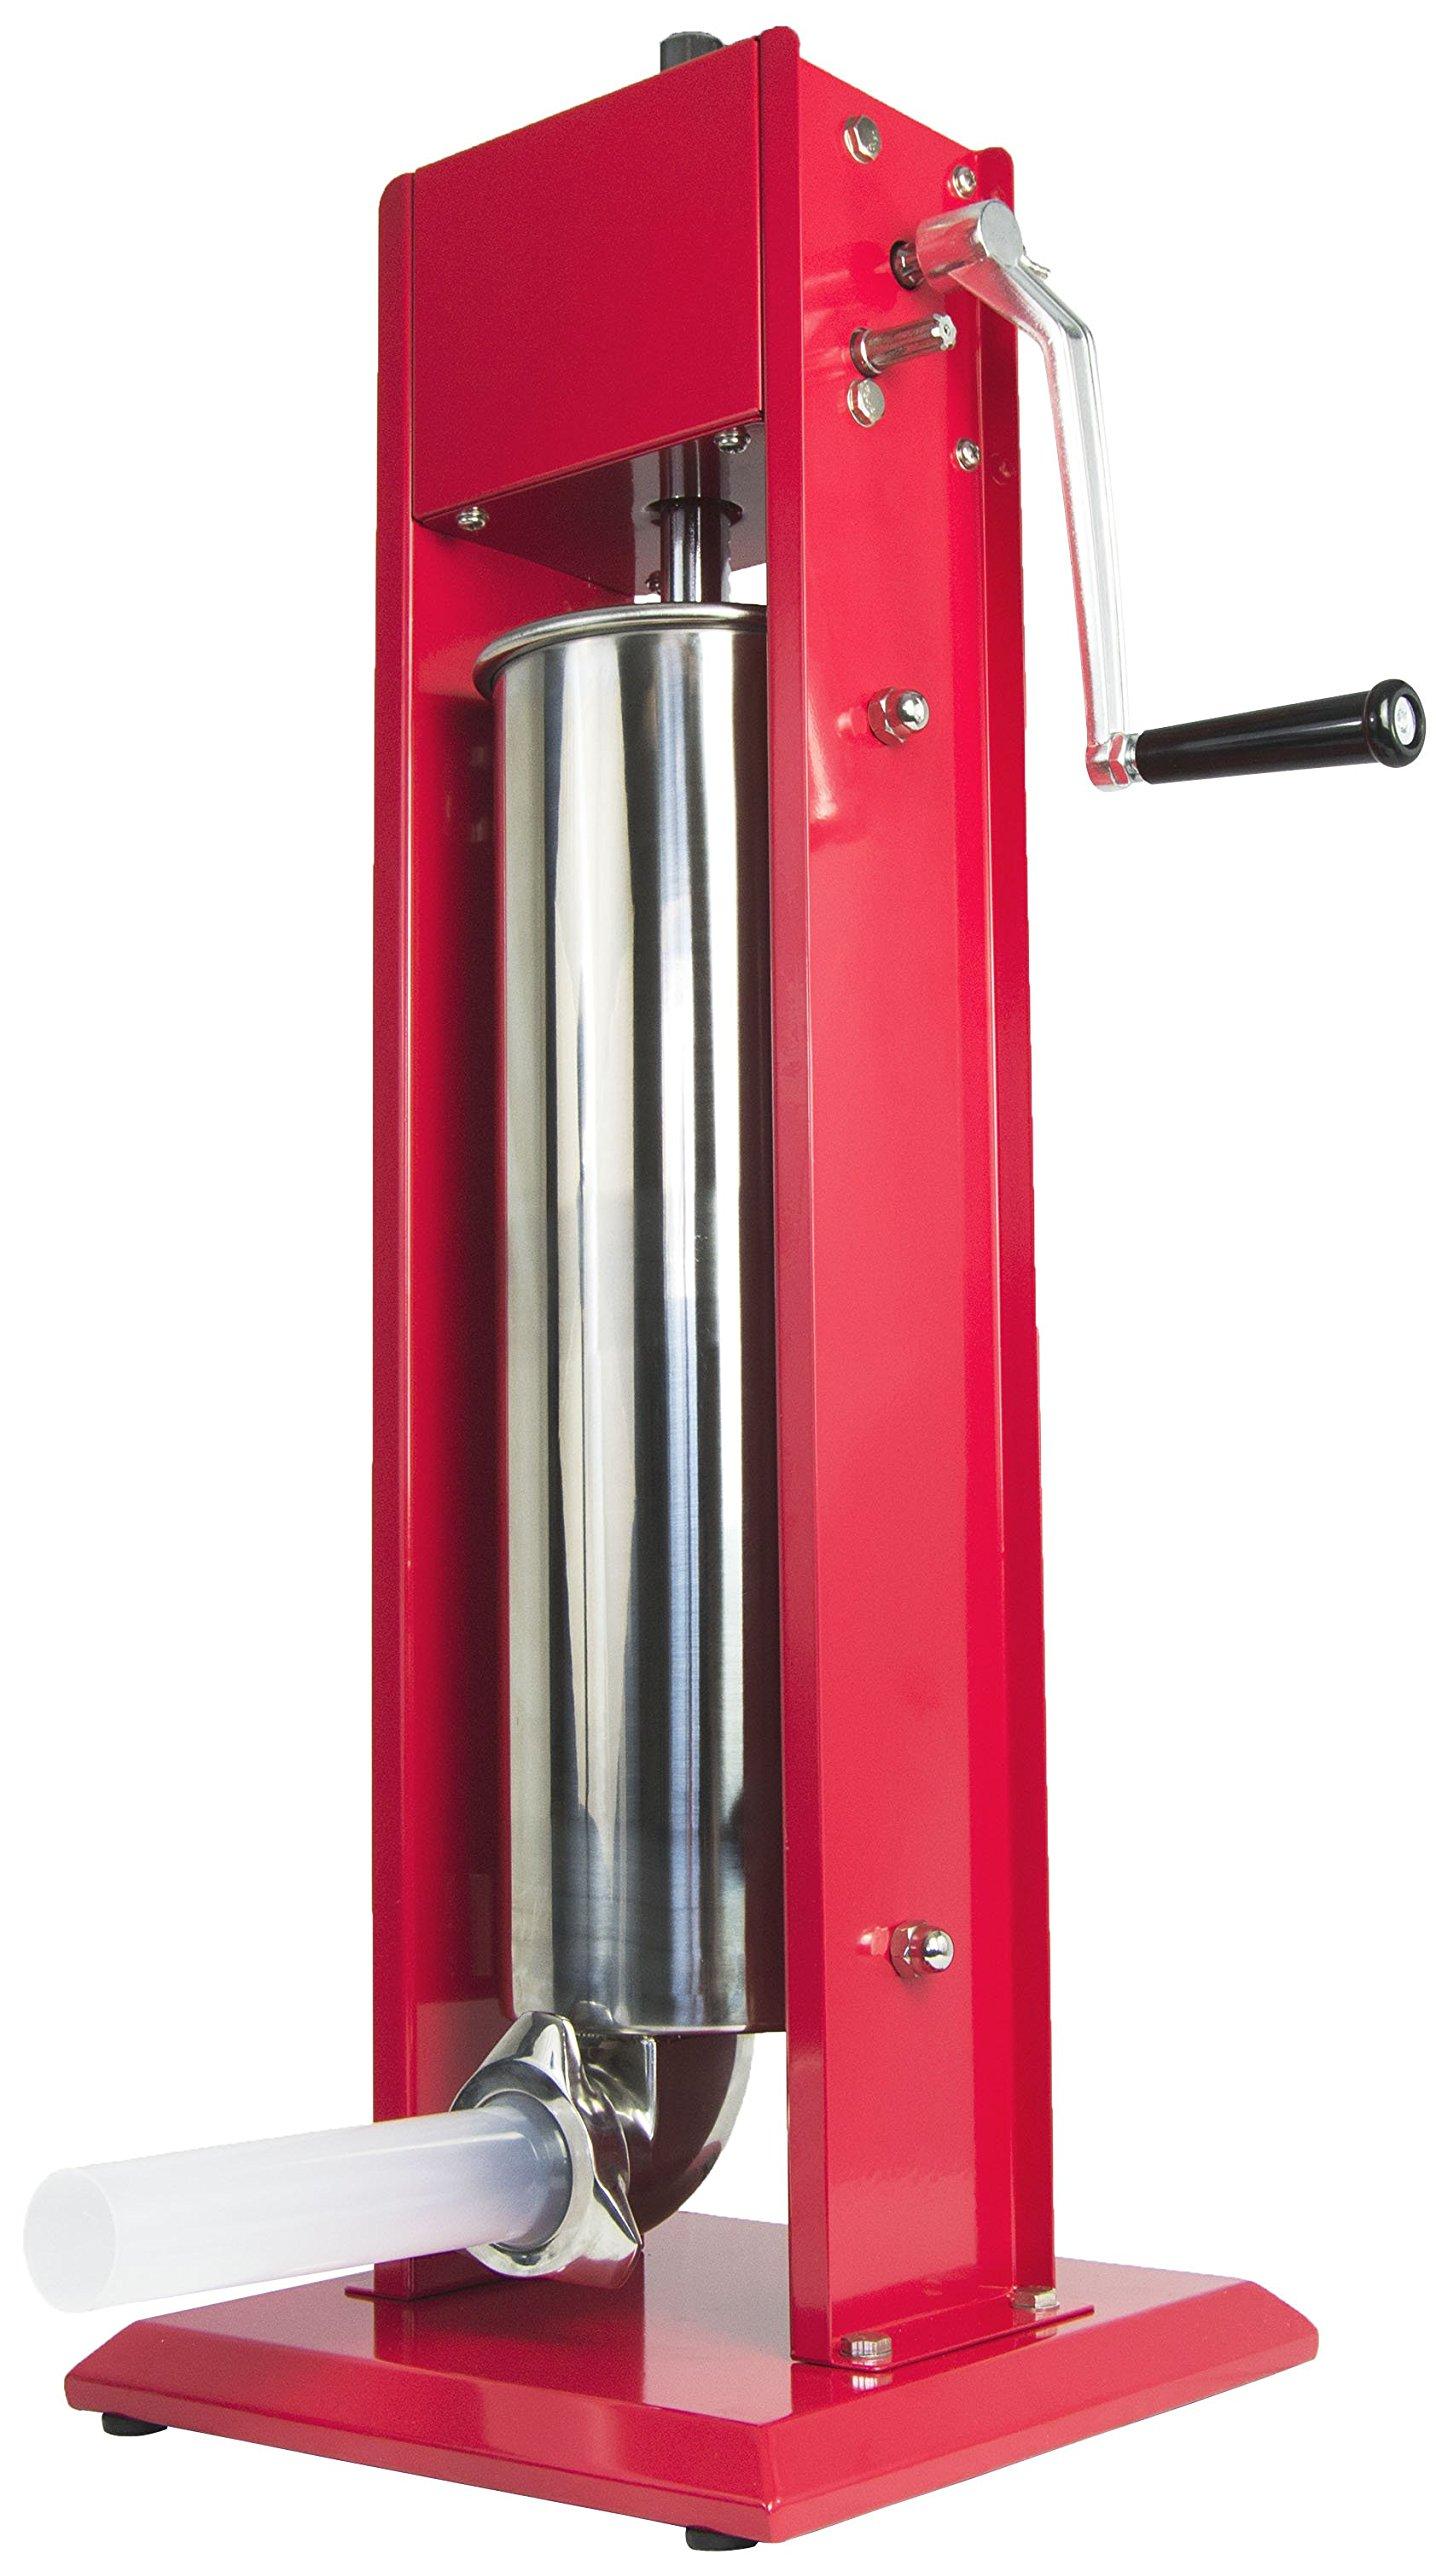 VIVO Sausage Stuffer Vertical 2 Speed Stainless Steel 7L/15lbs 15 Pound Meat Filler (STUFR-V207) by VIVO